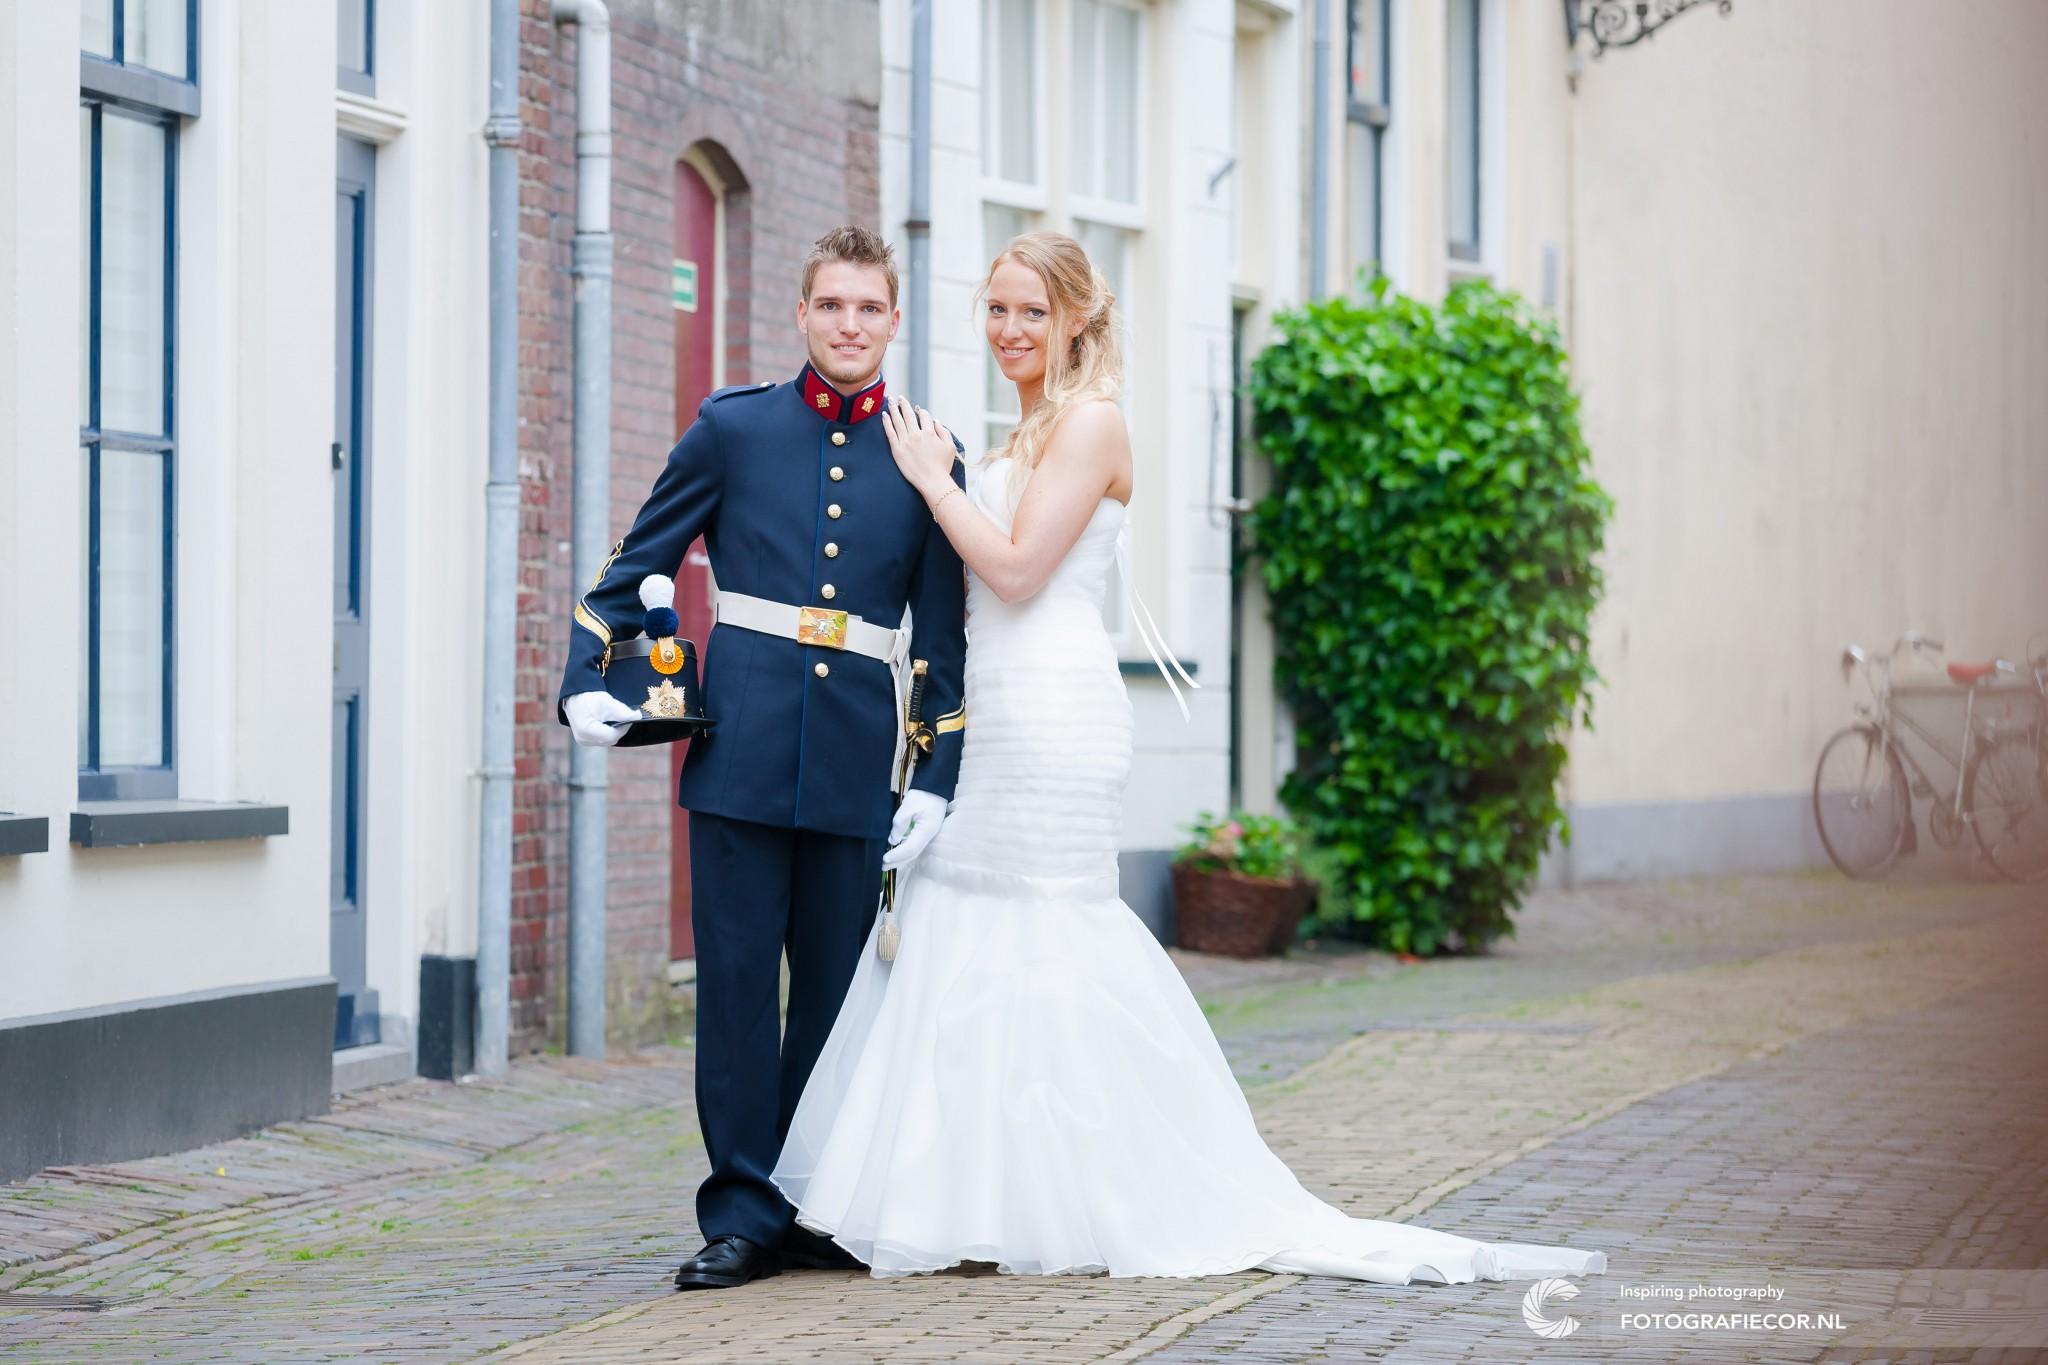 Kampen | keizerskwartier | bruid | bruidsfoto | bruidspaar | bruidsreportage | buiten trouwen | checklist trouwen | foto bruiloft | foto huwelijk | trouwfoto's | trouwlocaties | trouwreportage